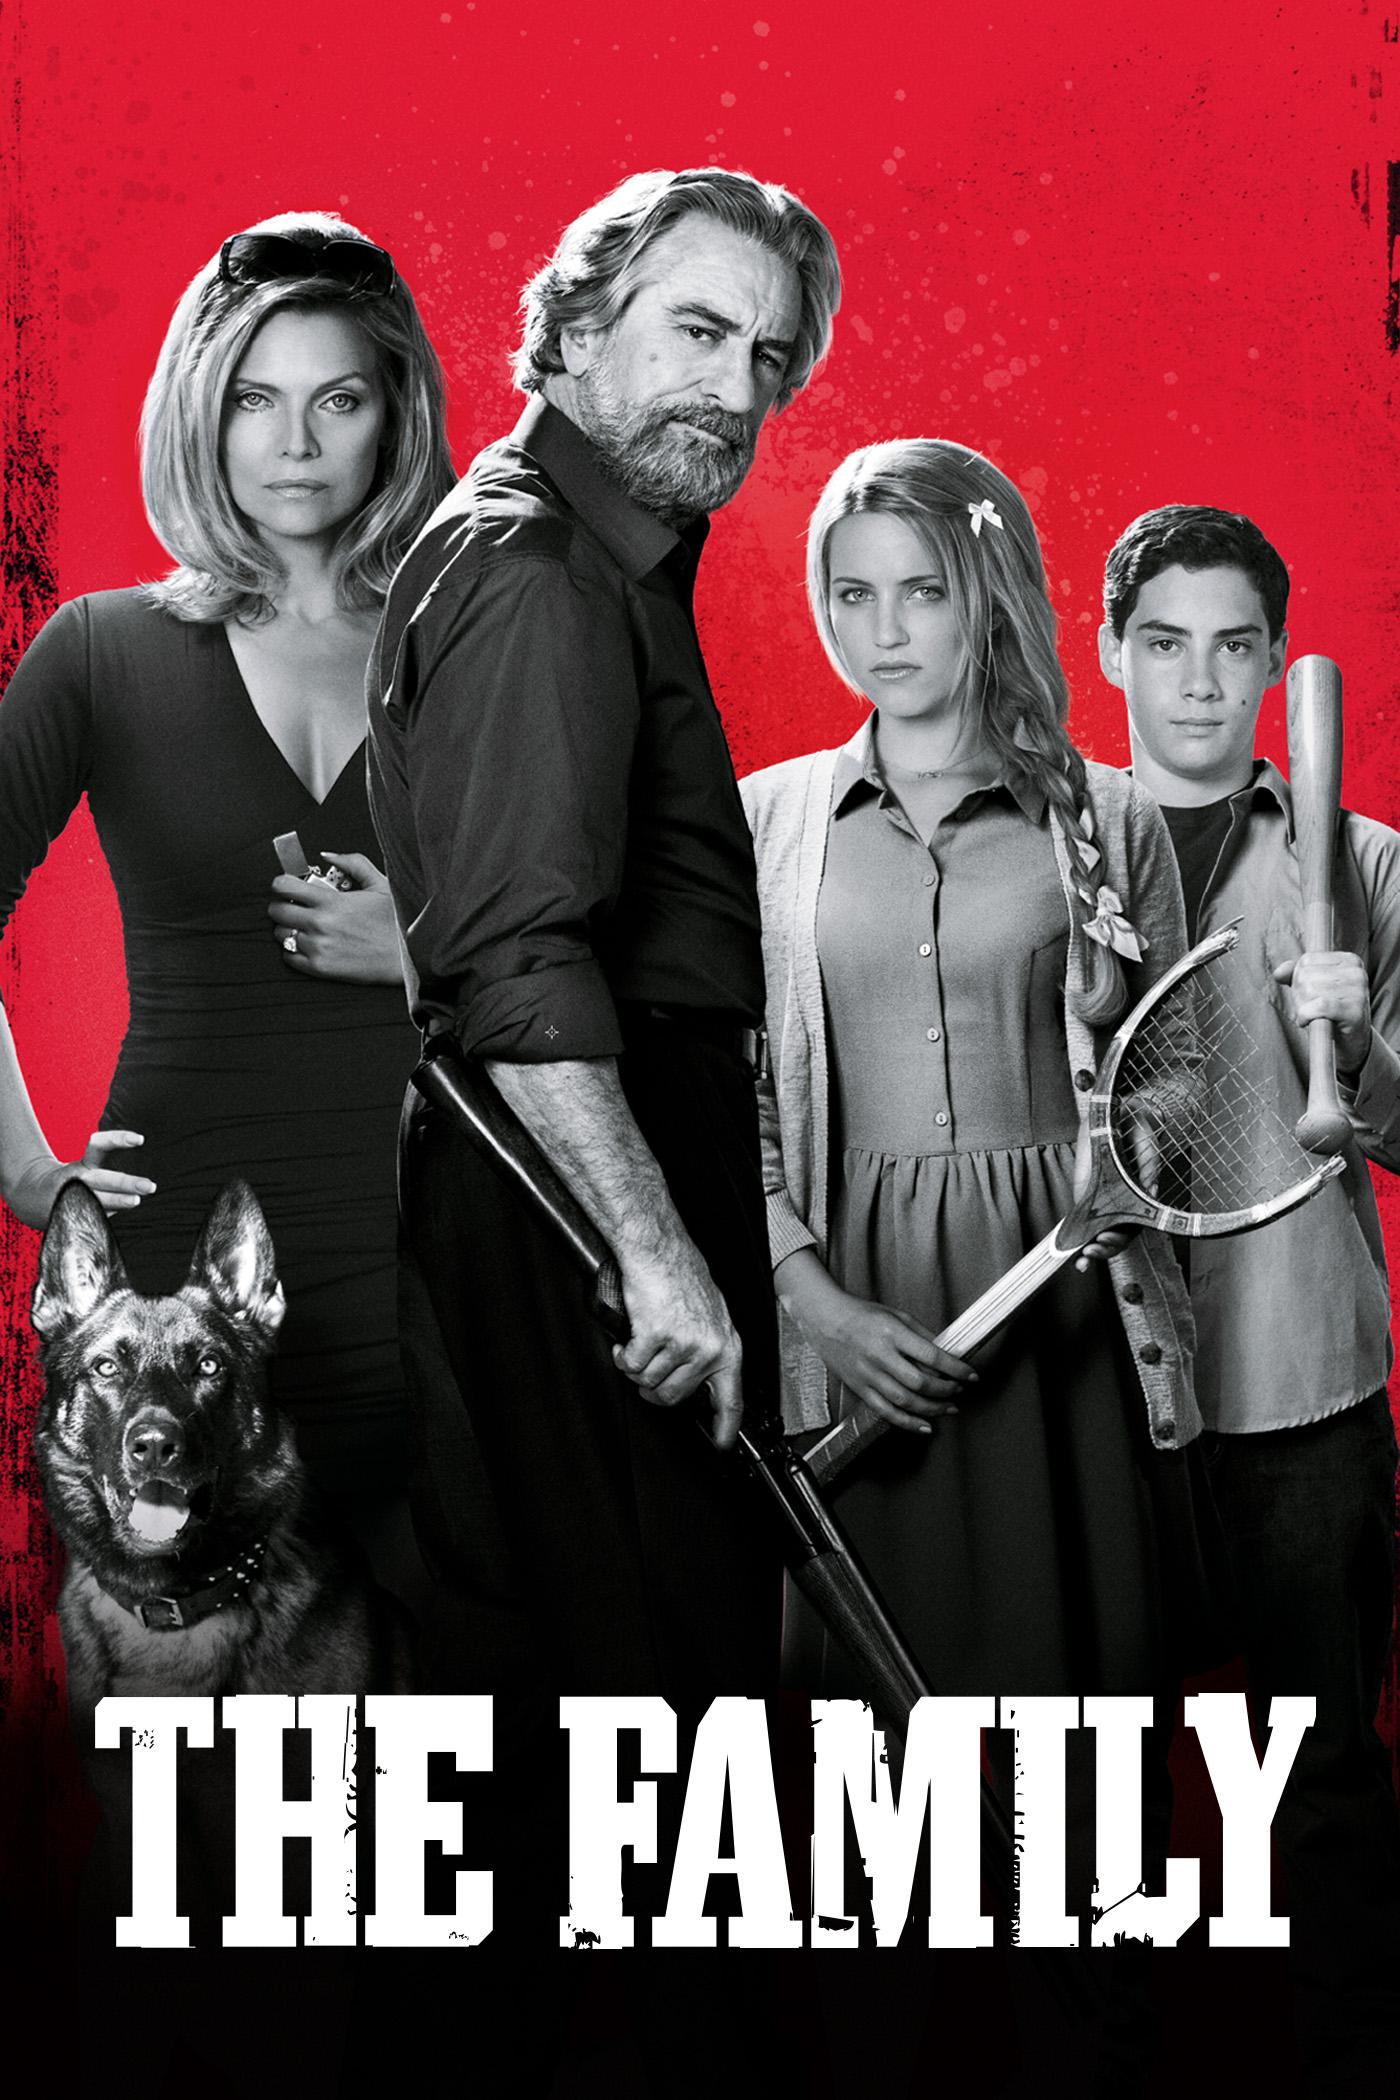 The family movie 2013